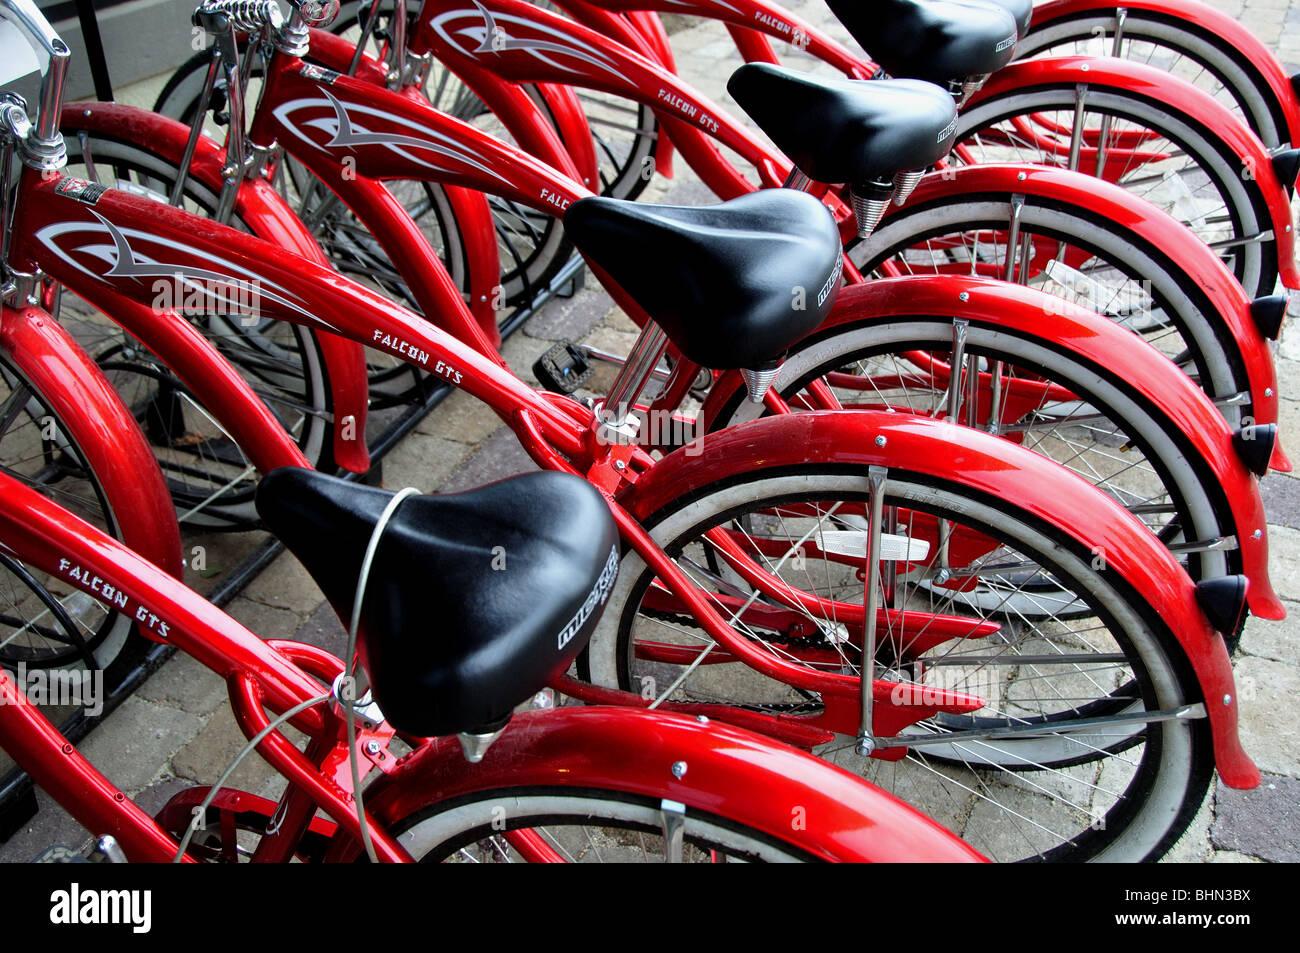 USA, Idaho, McCall, Rental Bicycles - Stock Image